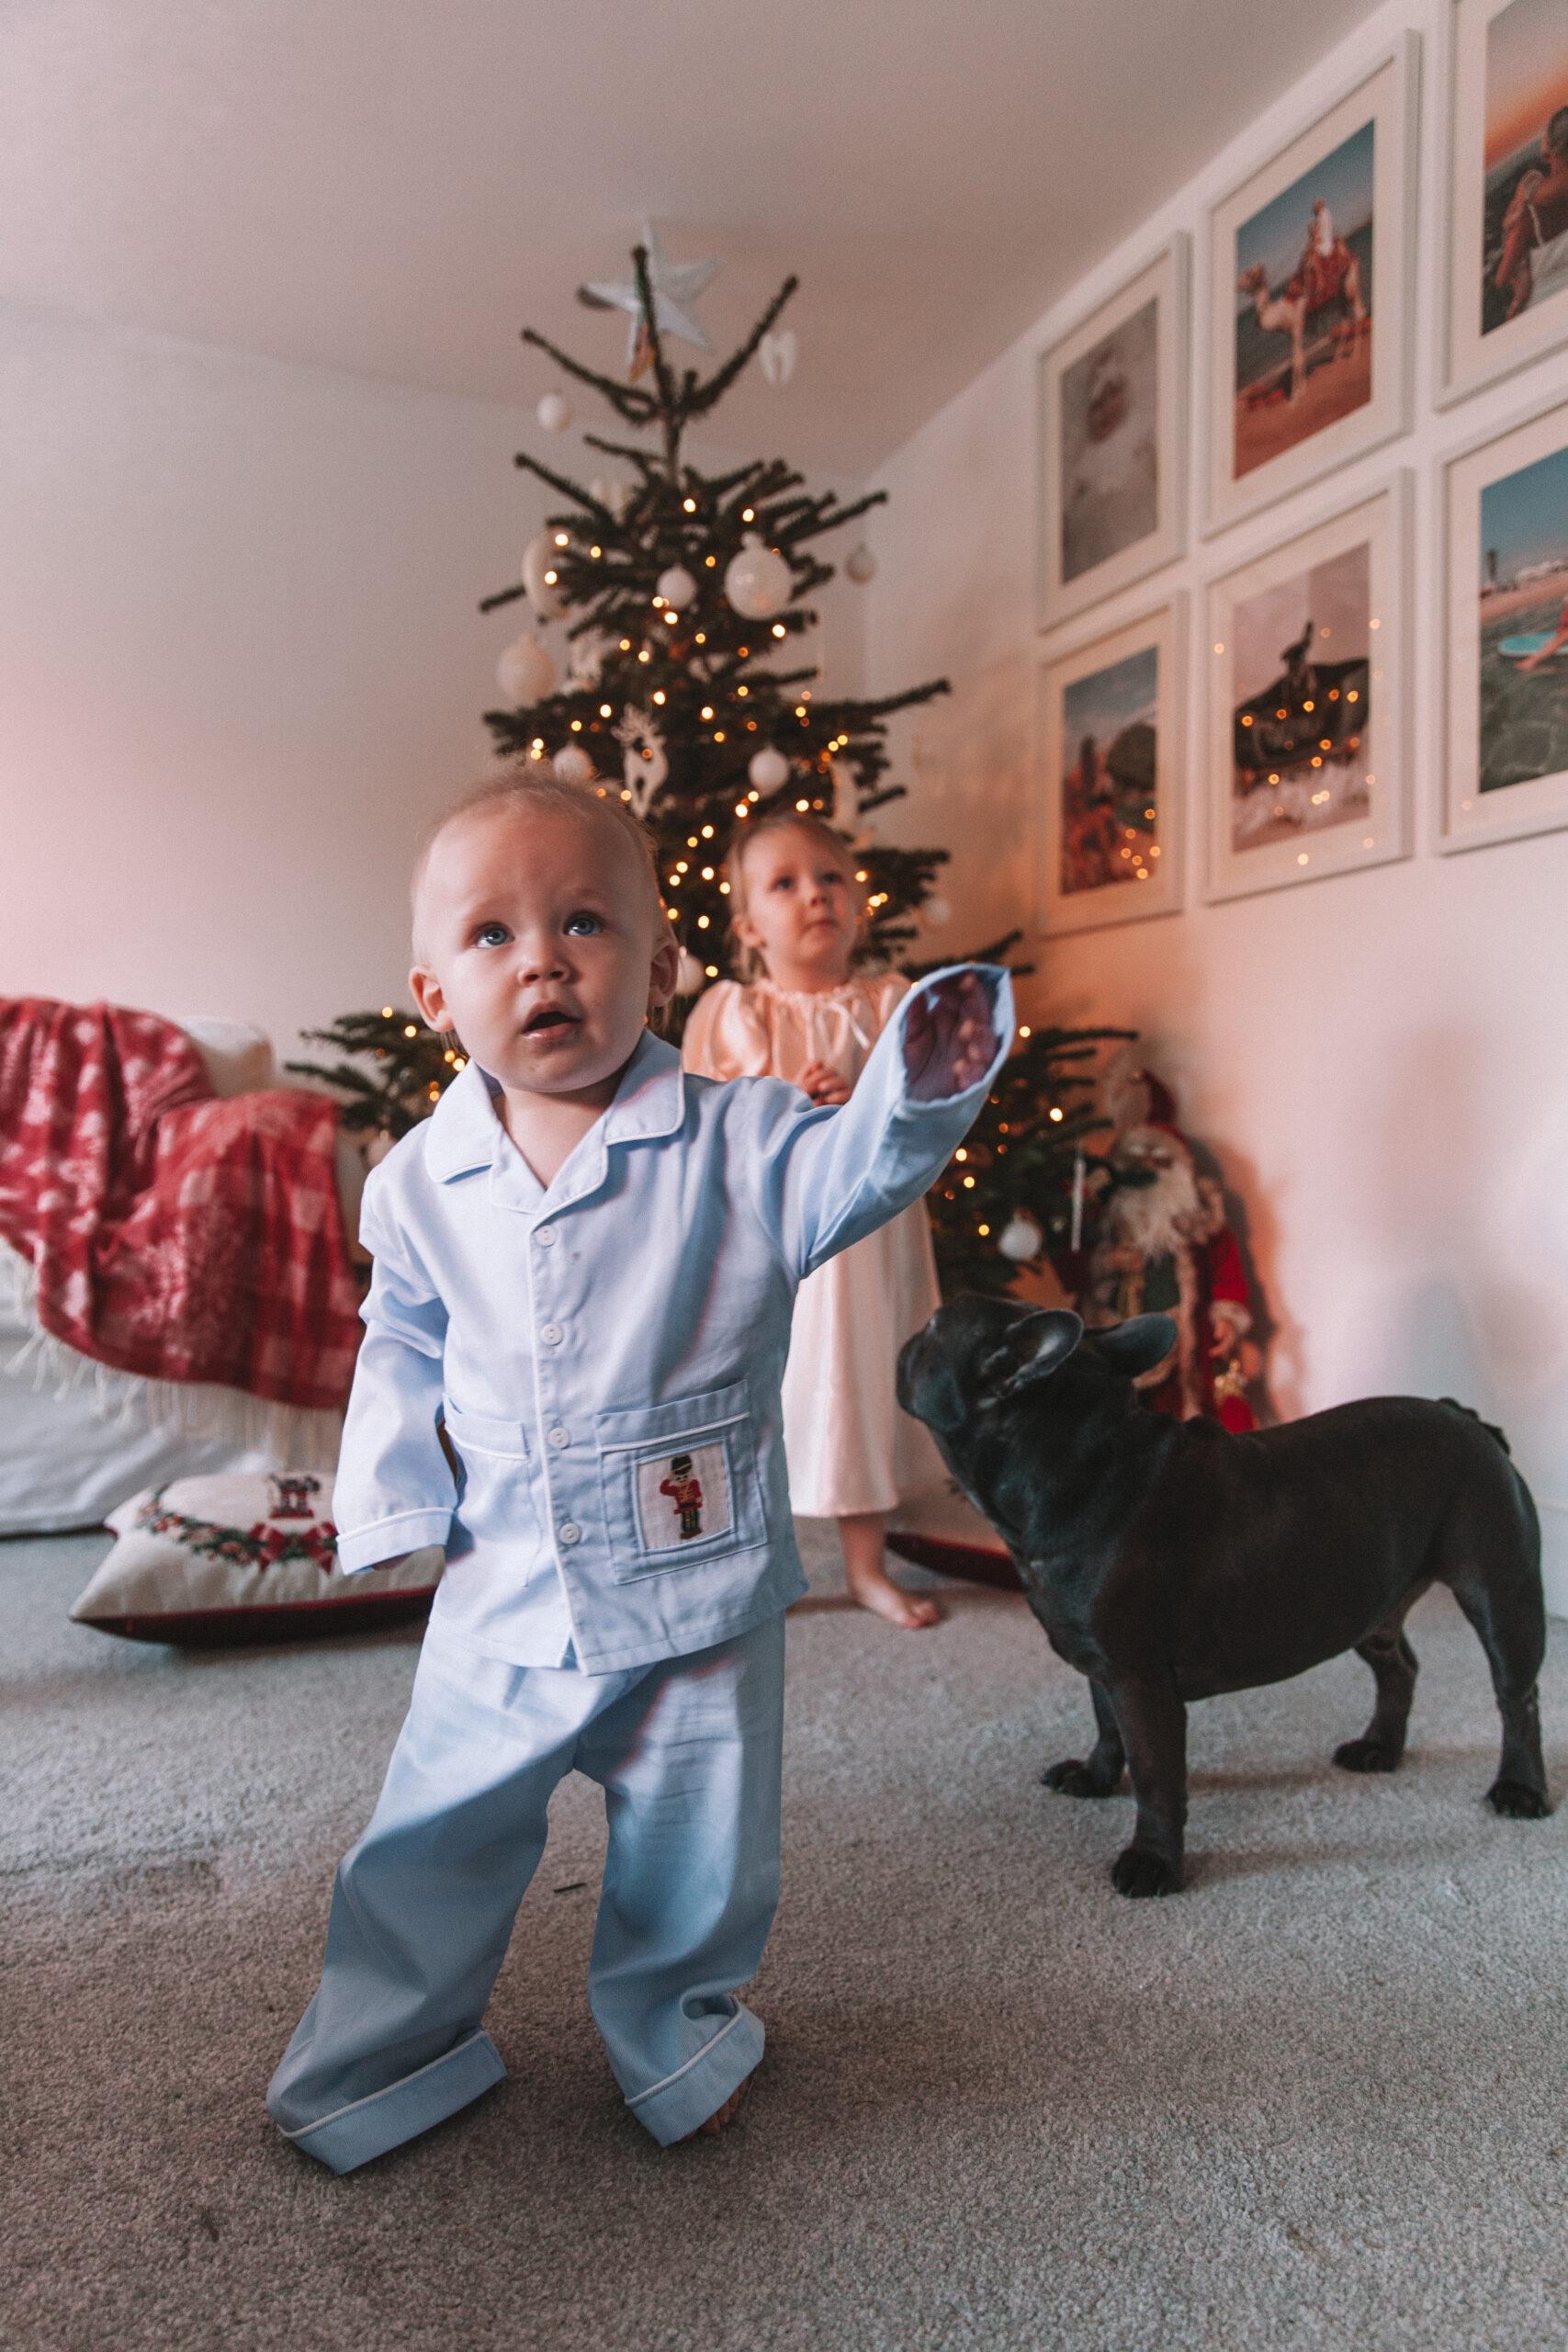 Childrensalon_Christmas_Pyjamas_Childrens_01